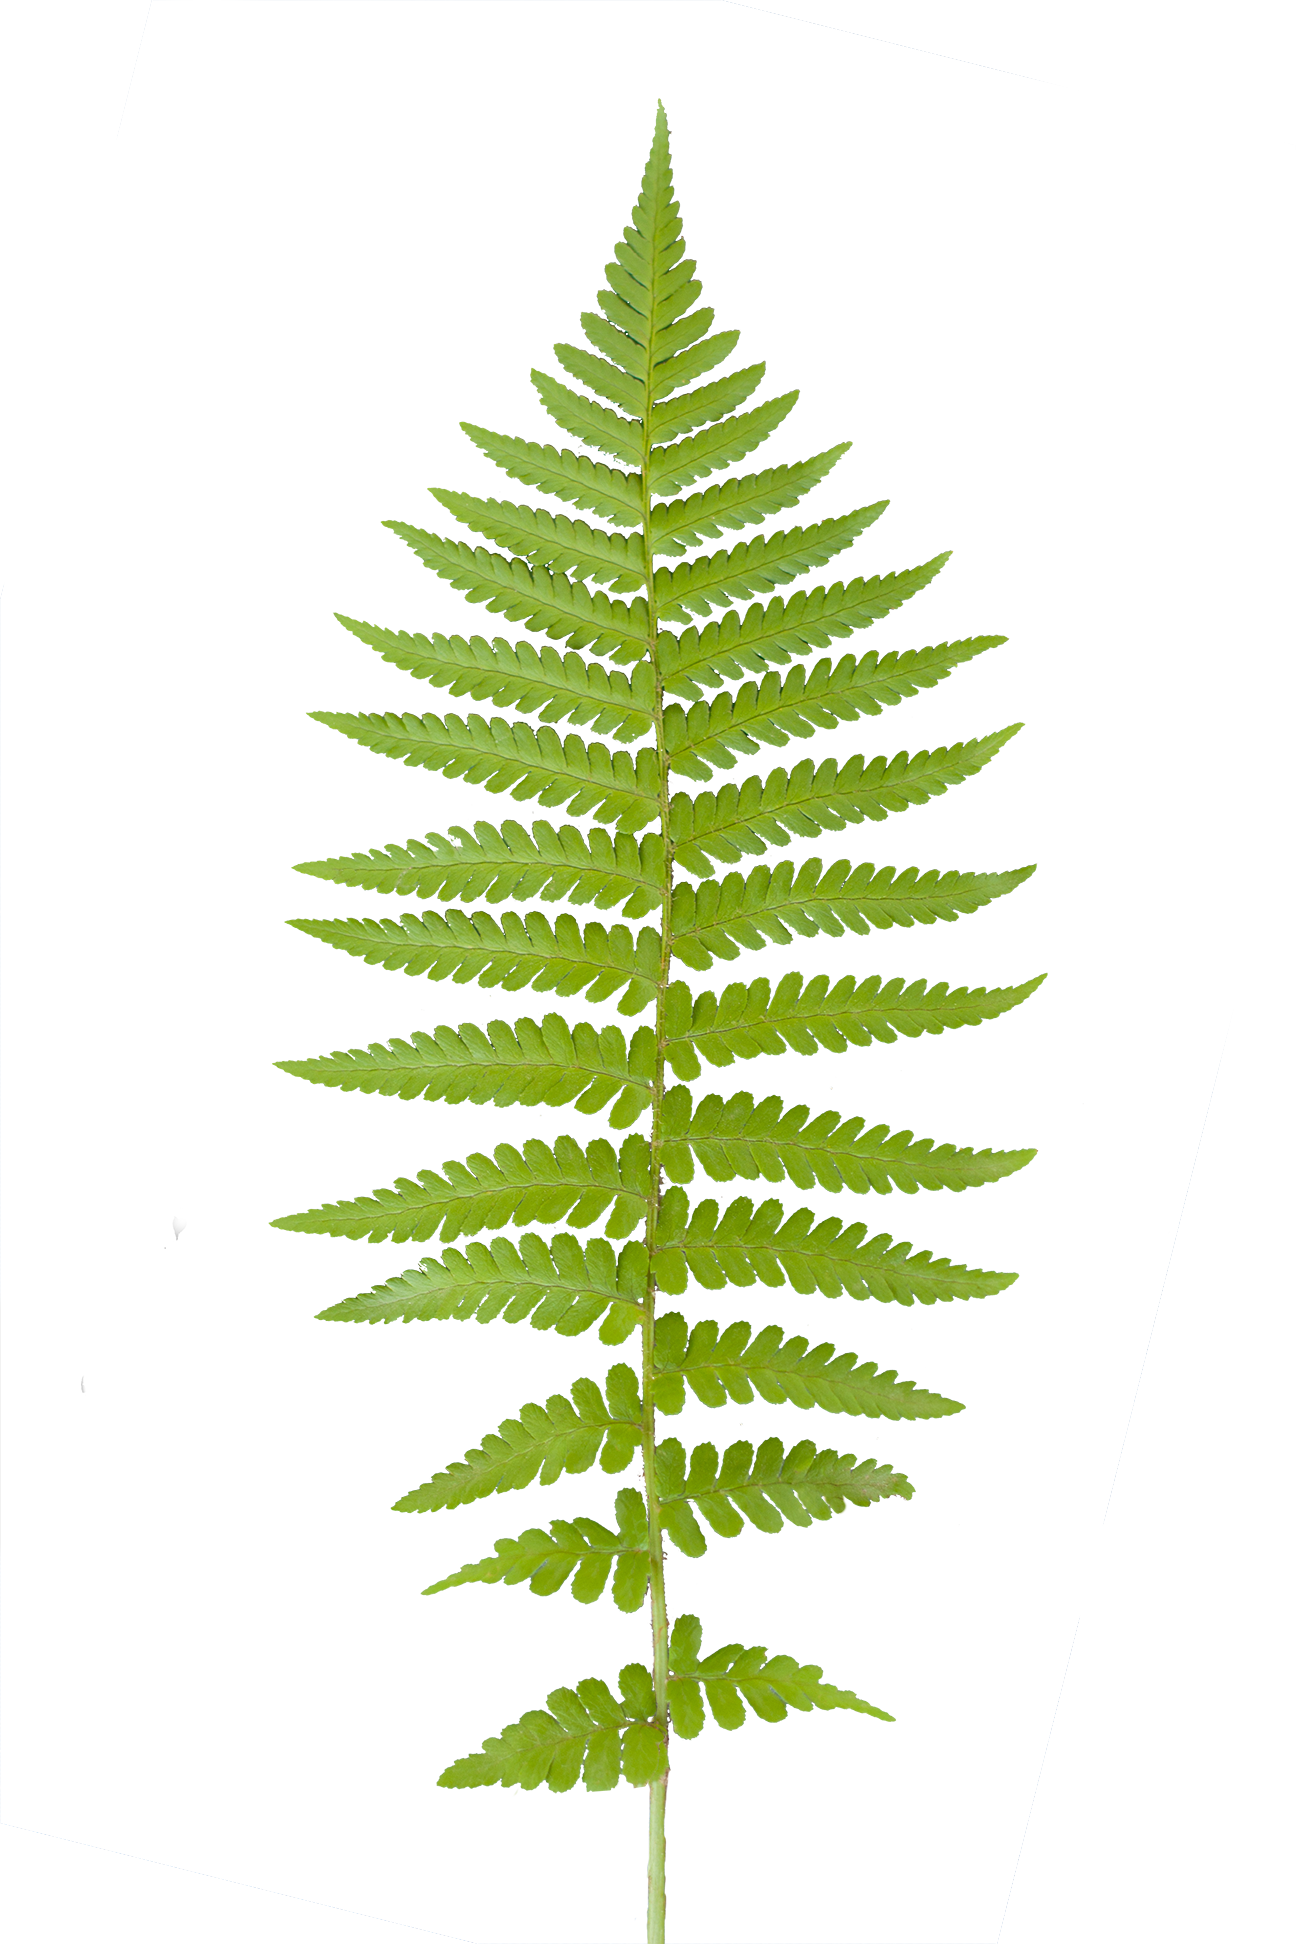 Clipart forest texture. Paramecij s vegetation base